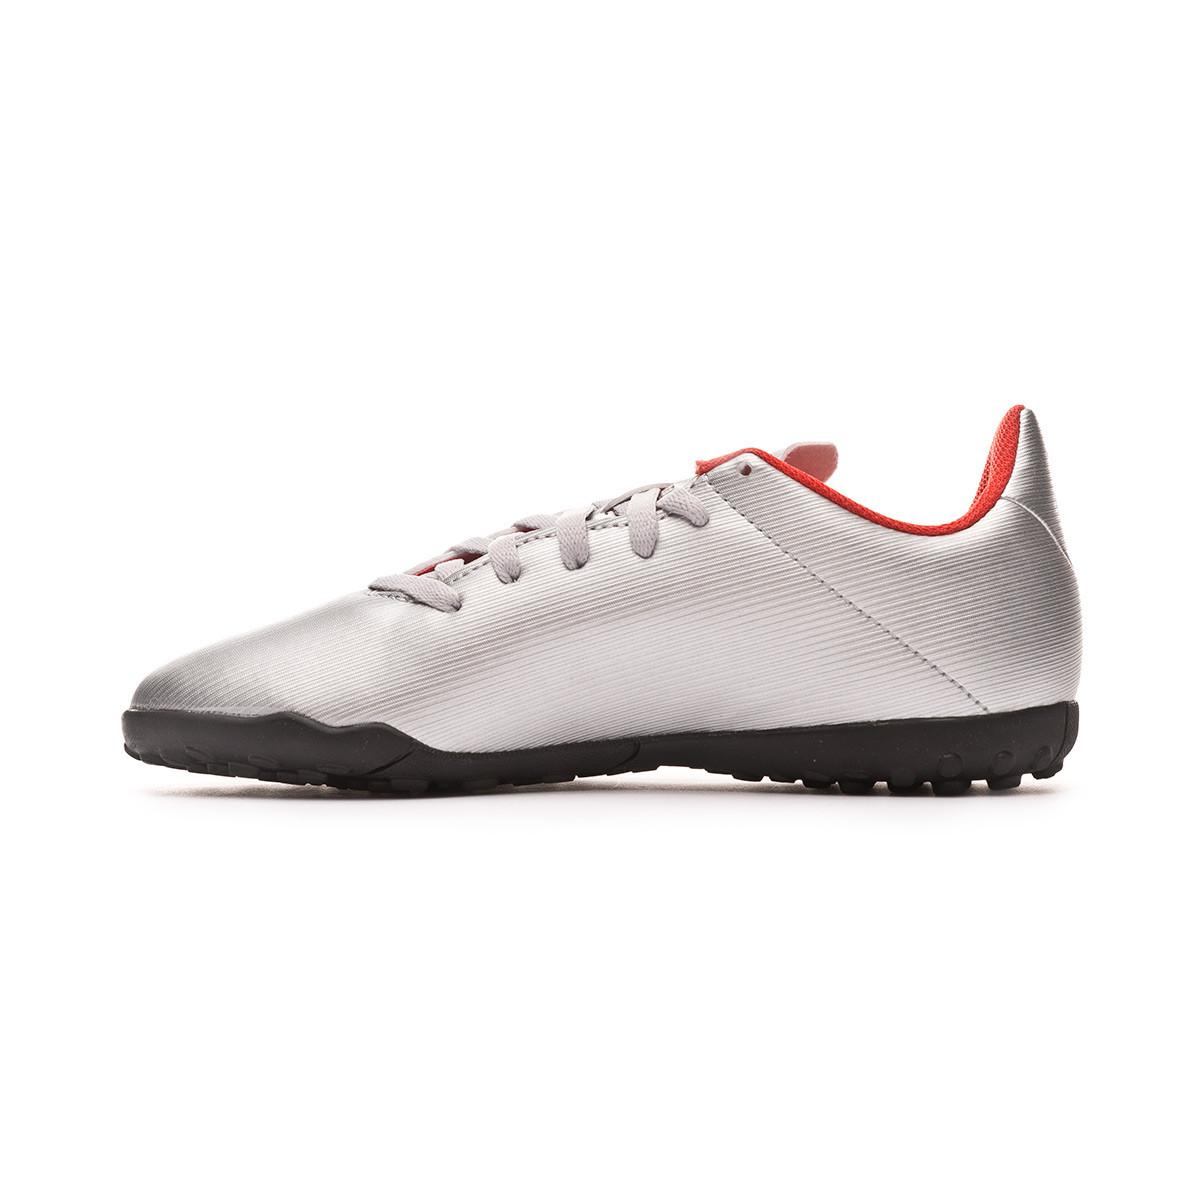 2ad7a821e Football Boot adidas X 19.4 Turf Niño Silver metallic-Hi red-White -  Football store Fútbol Emotion